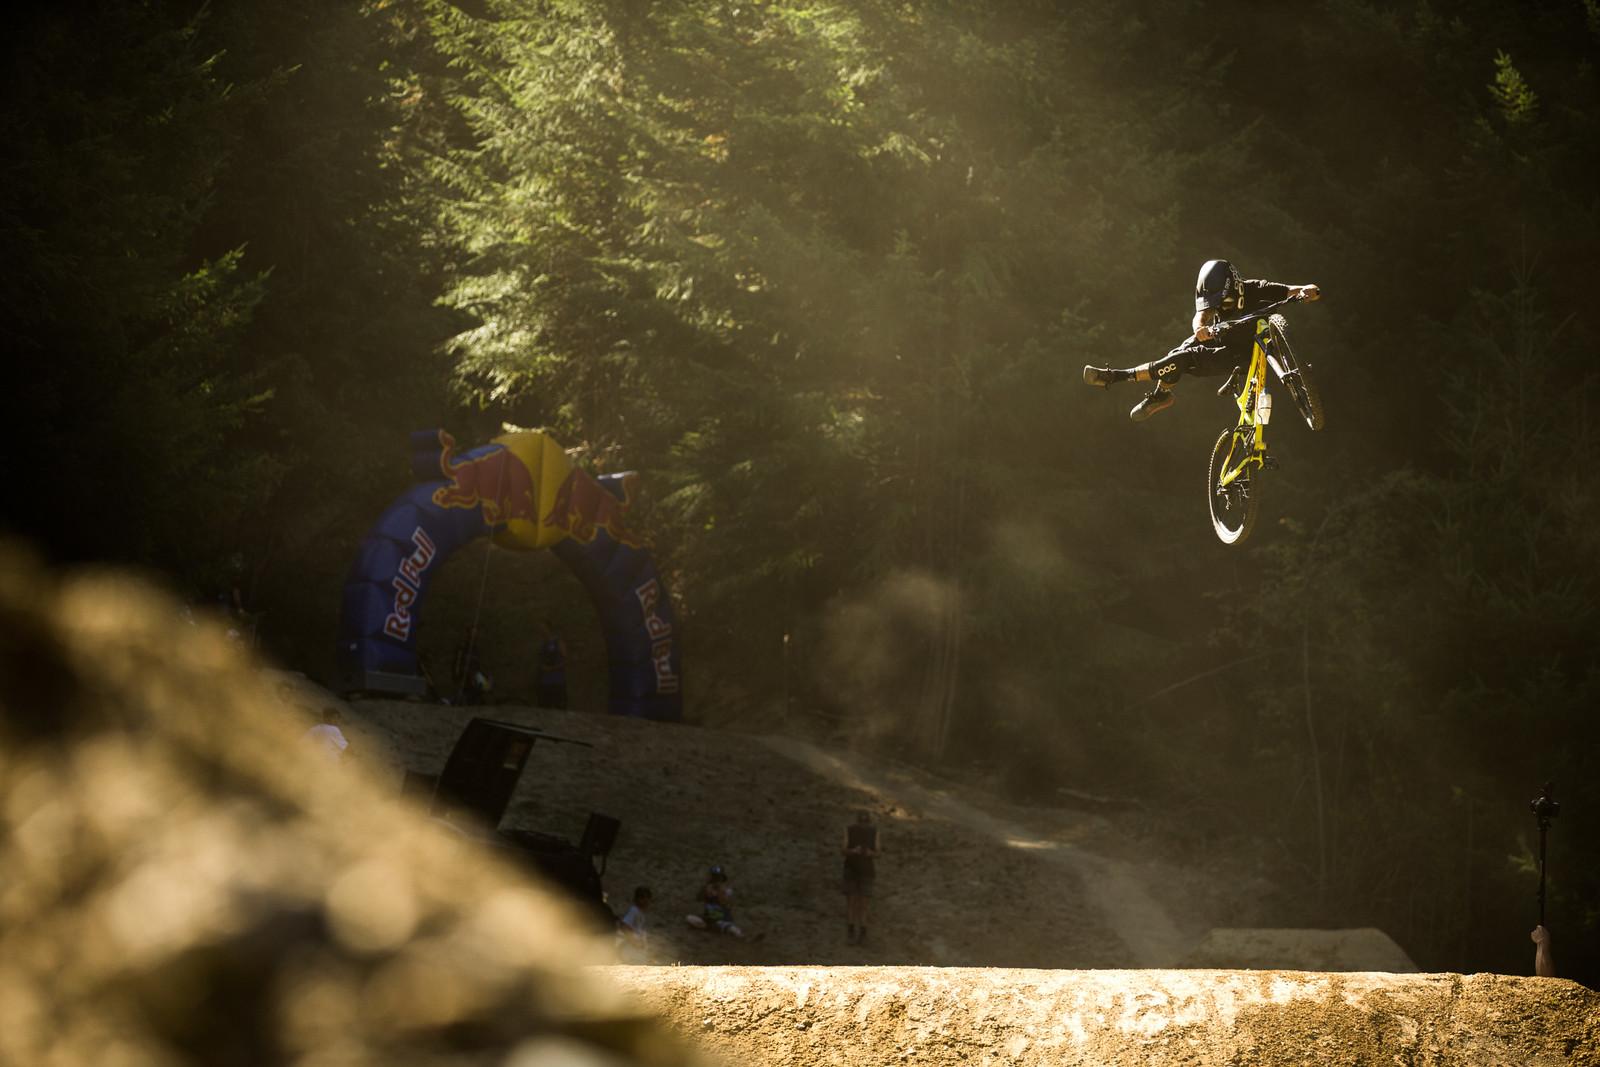 Oliver Cuvet - McGazza Fest Dream Track Jam - Mountain Biking Pictures - Vital MTB